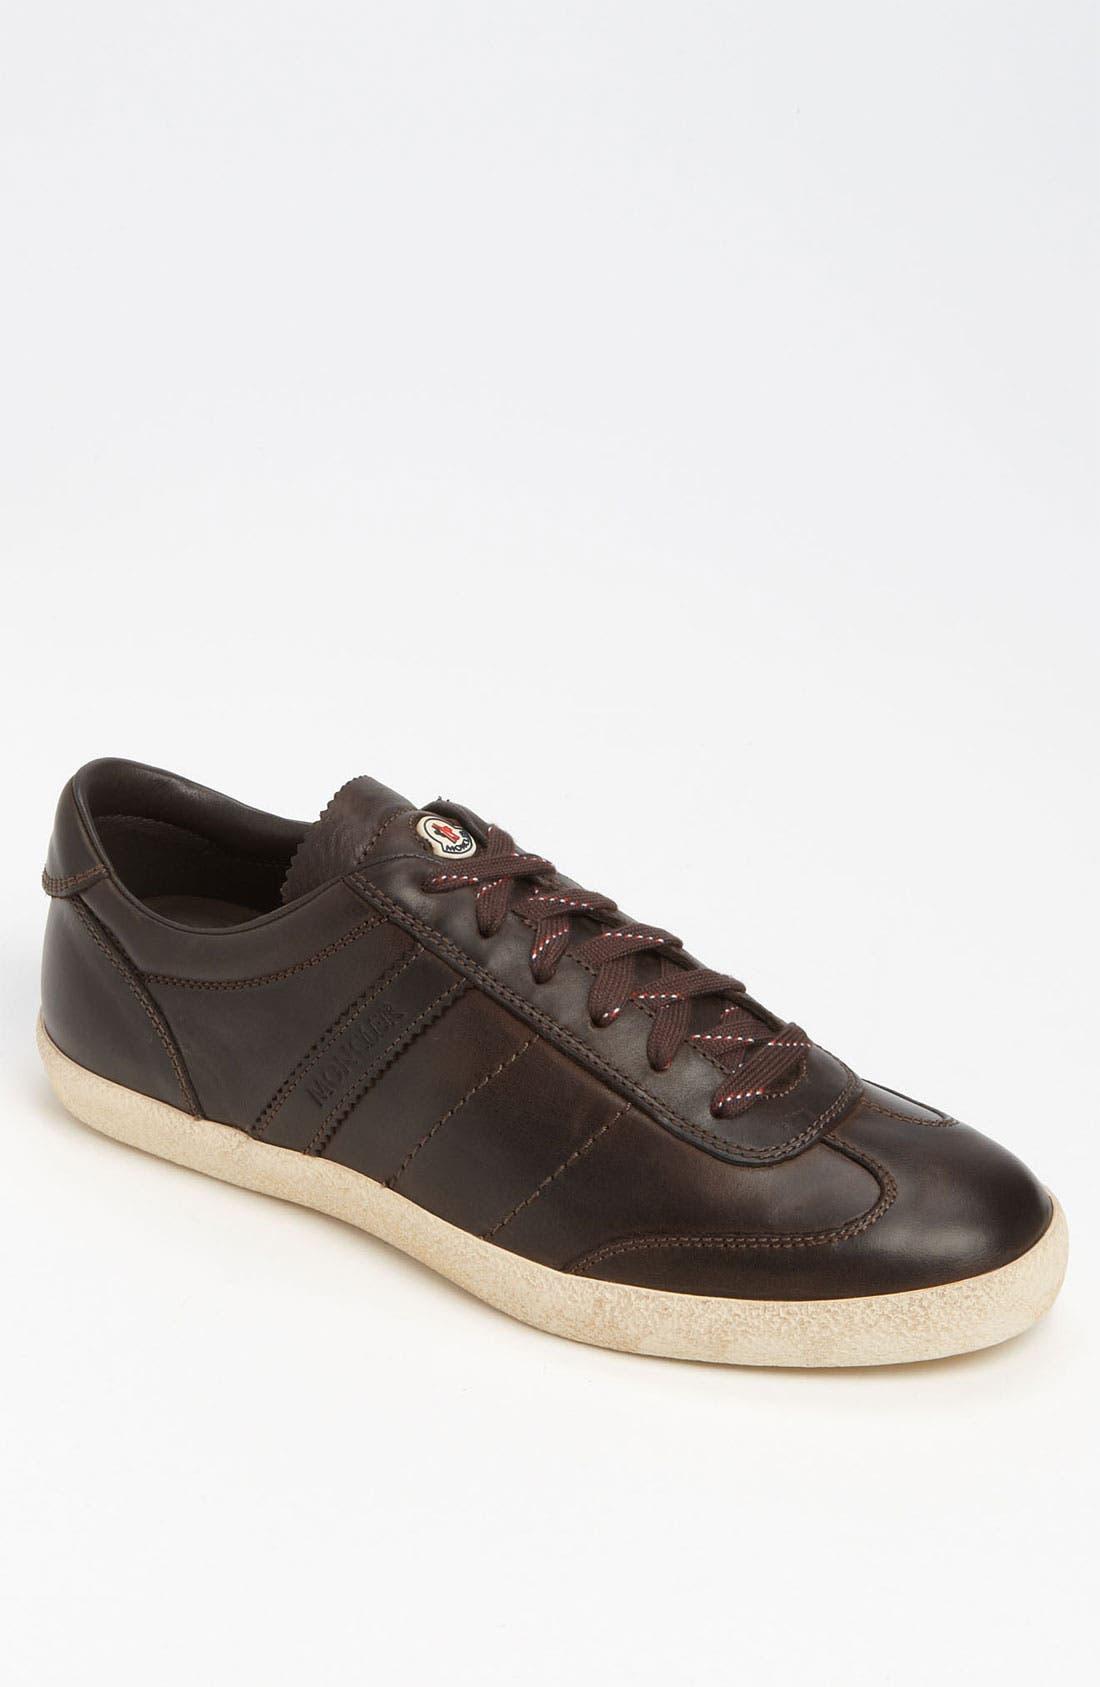 Main Image - Moncler 'Biarritz' Sneaker